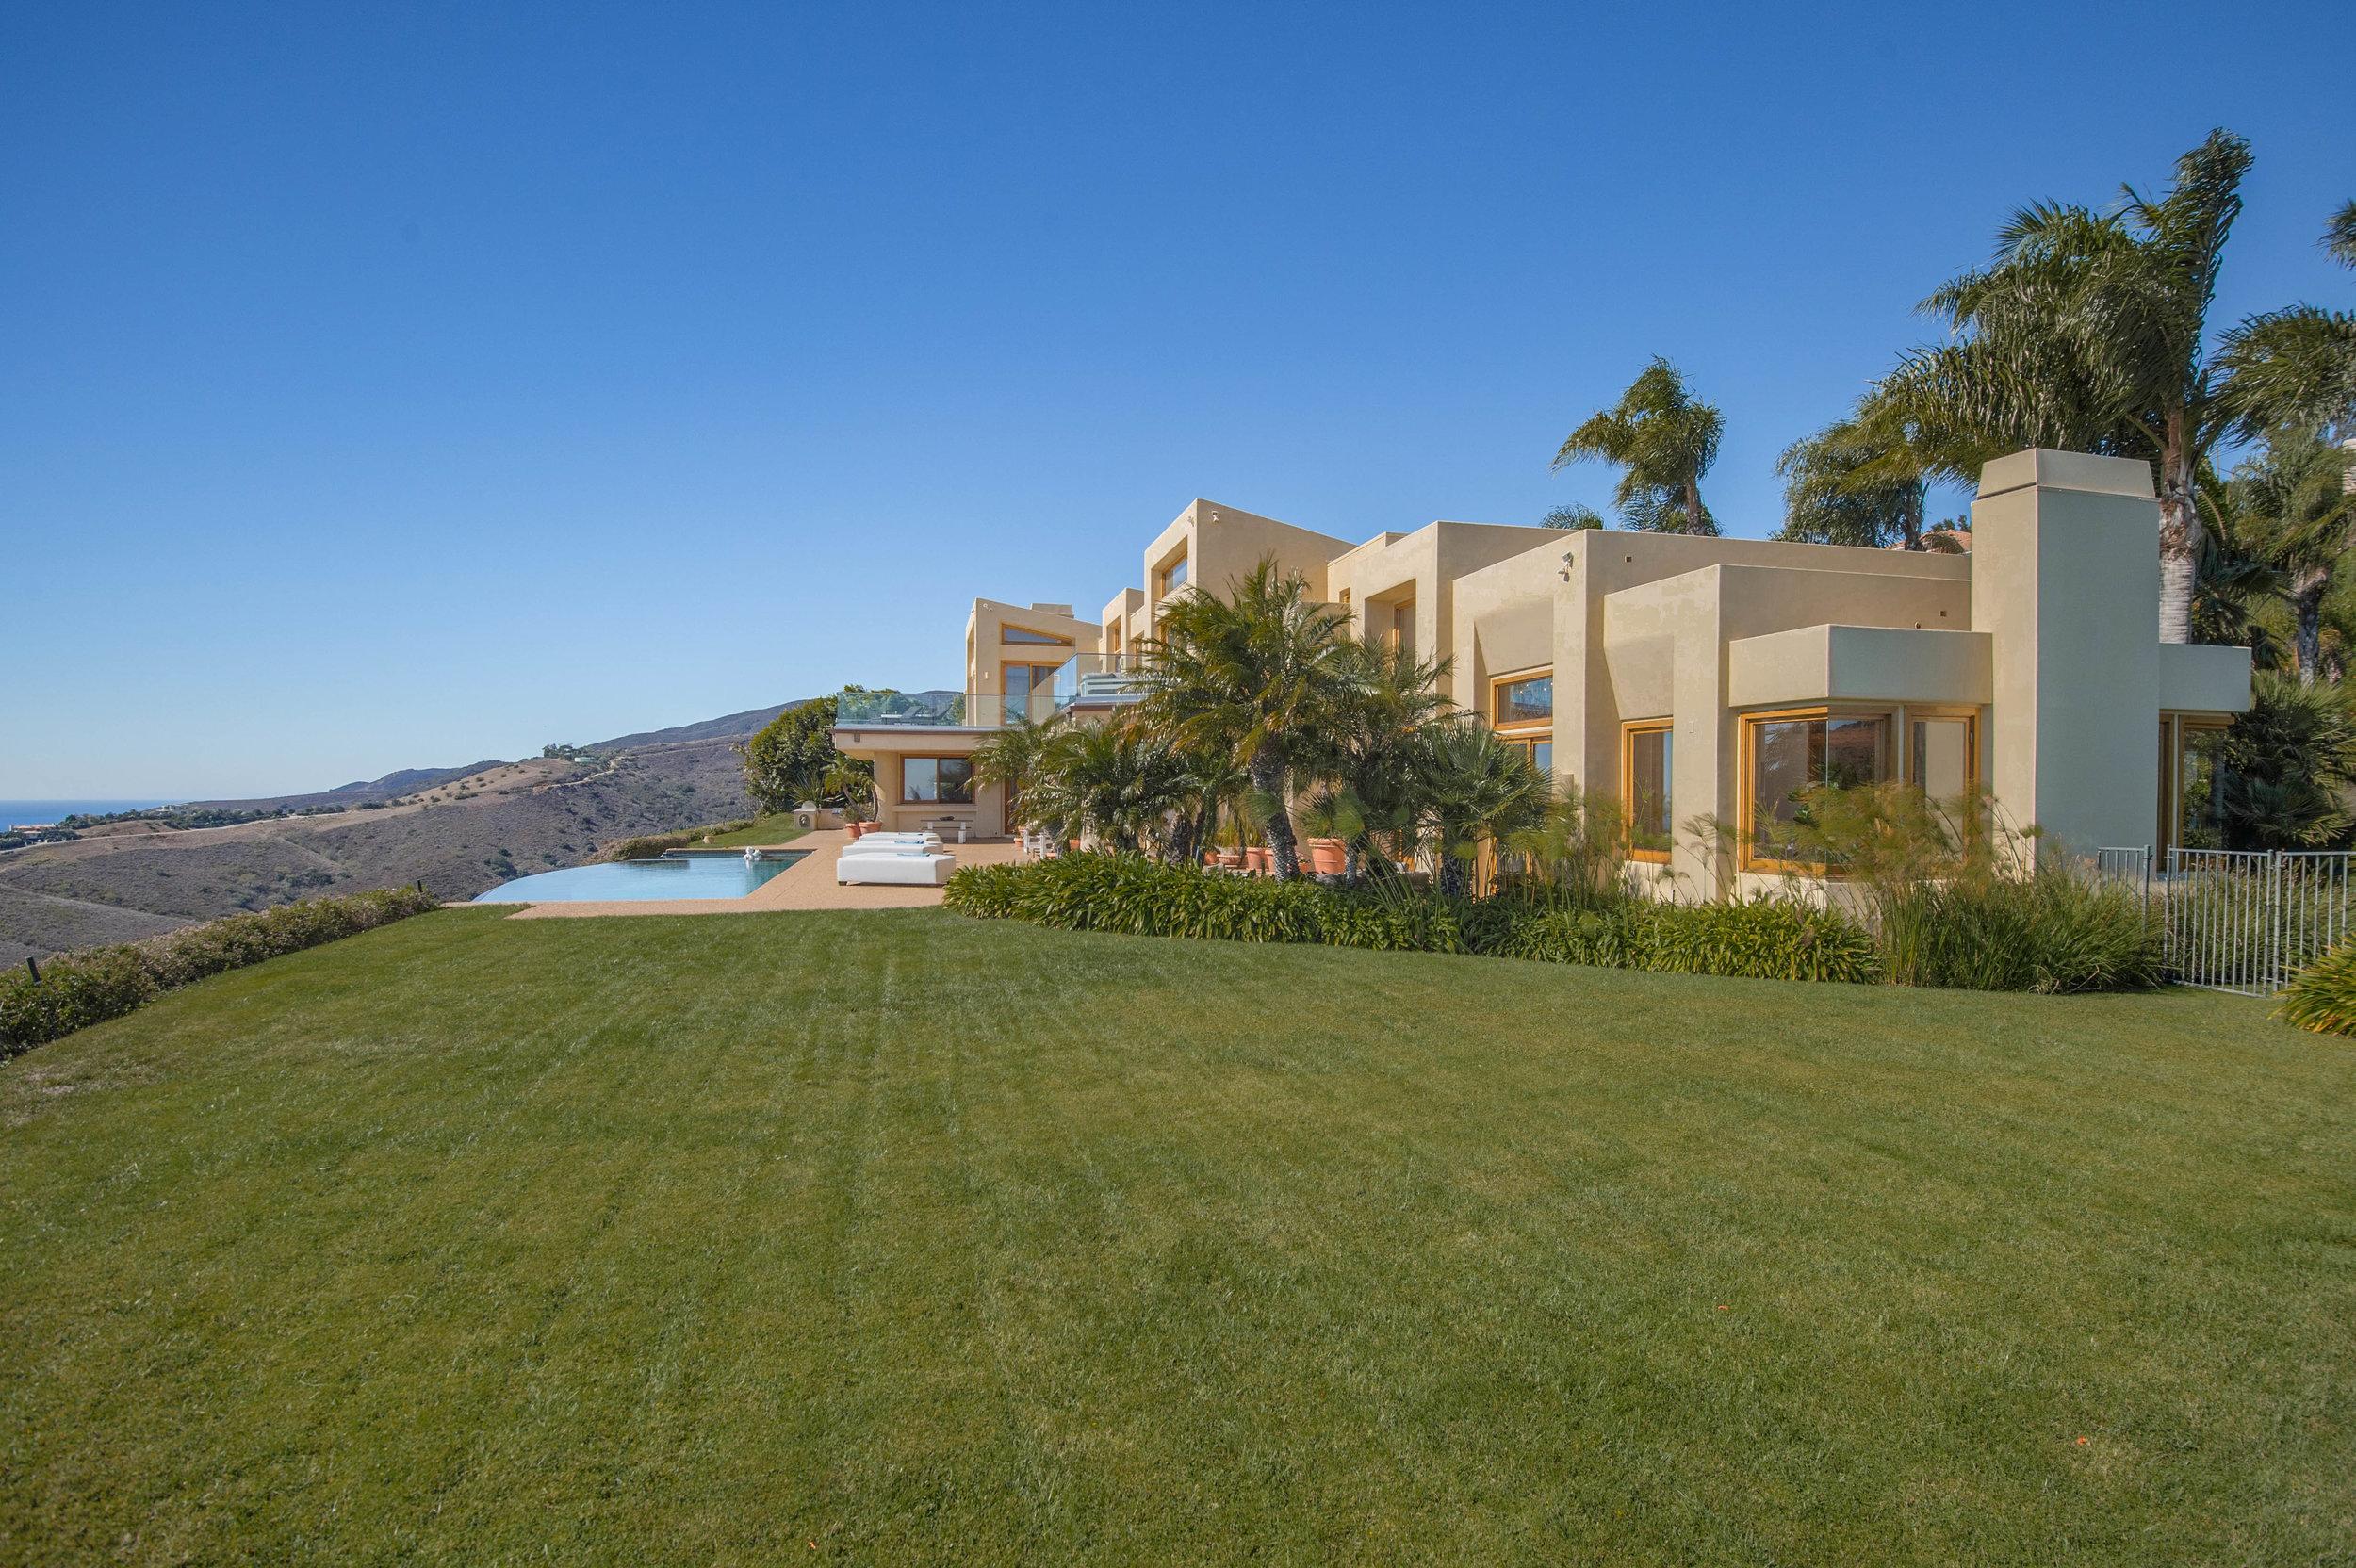 028 Pool Yard 27475 Latigo Bay View Drive For Sale Lease The Malibu Life Team Luxury Real Estate.jpg